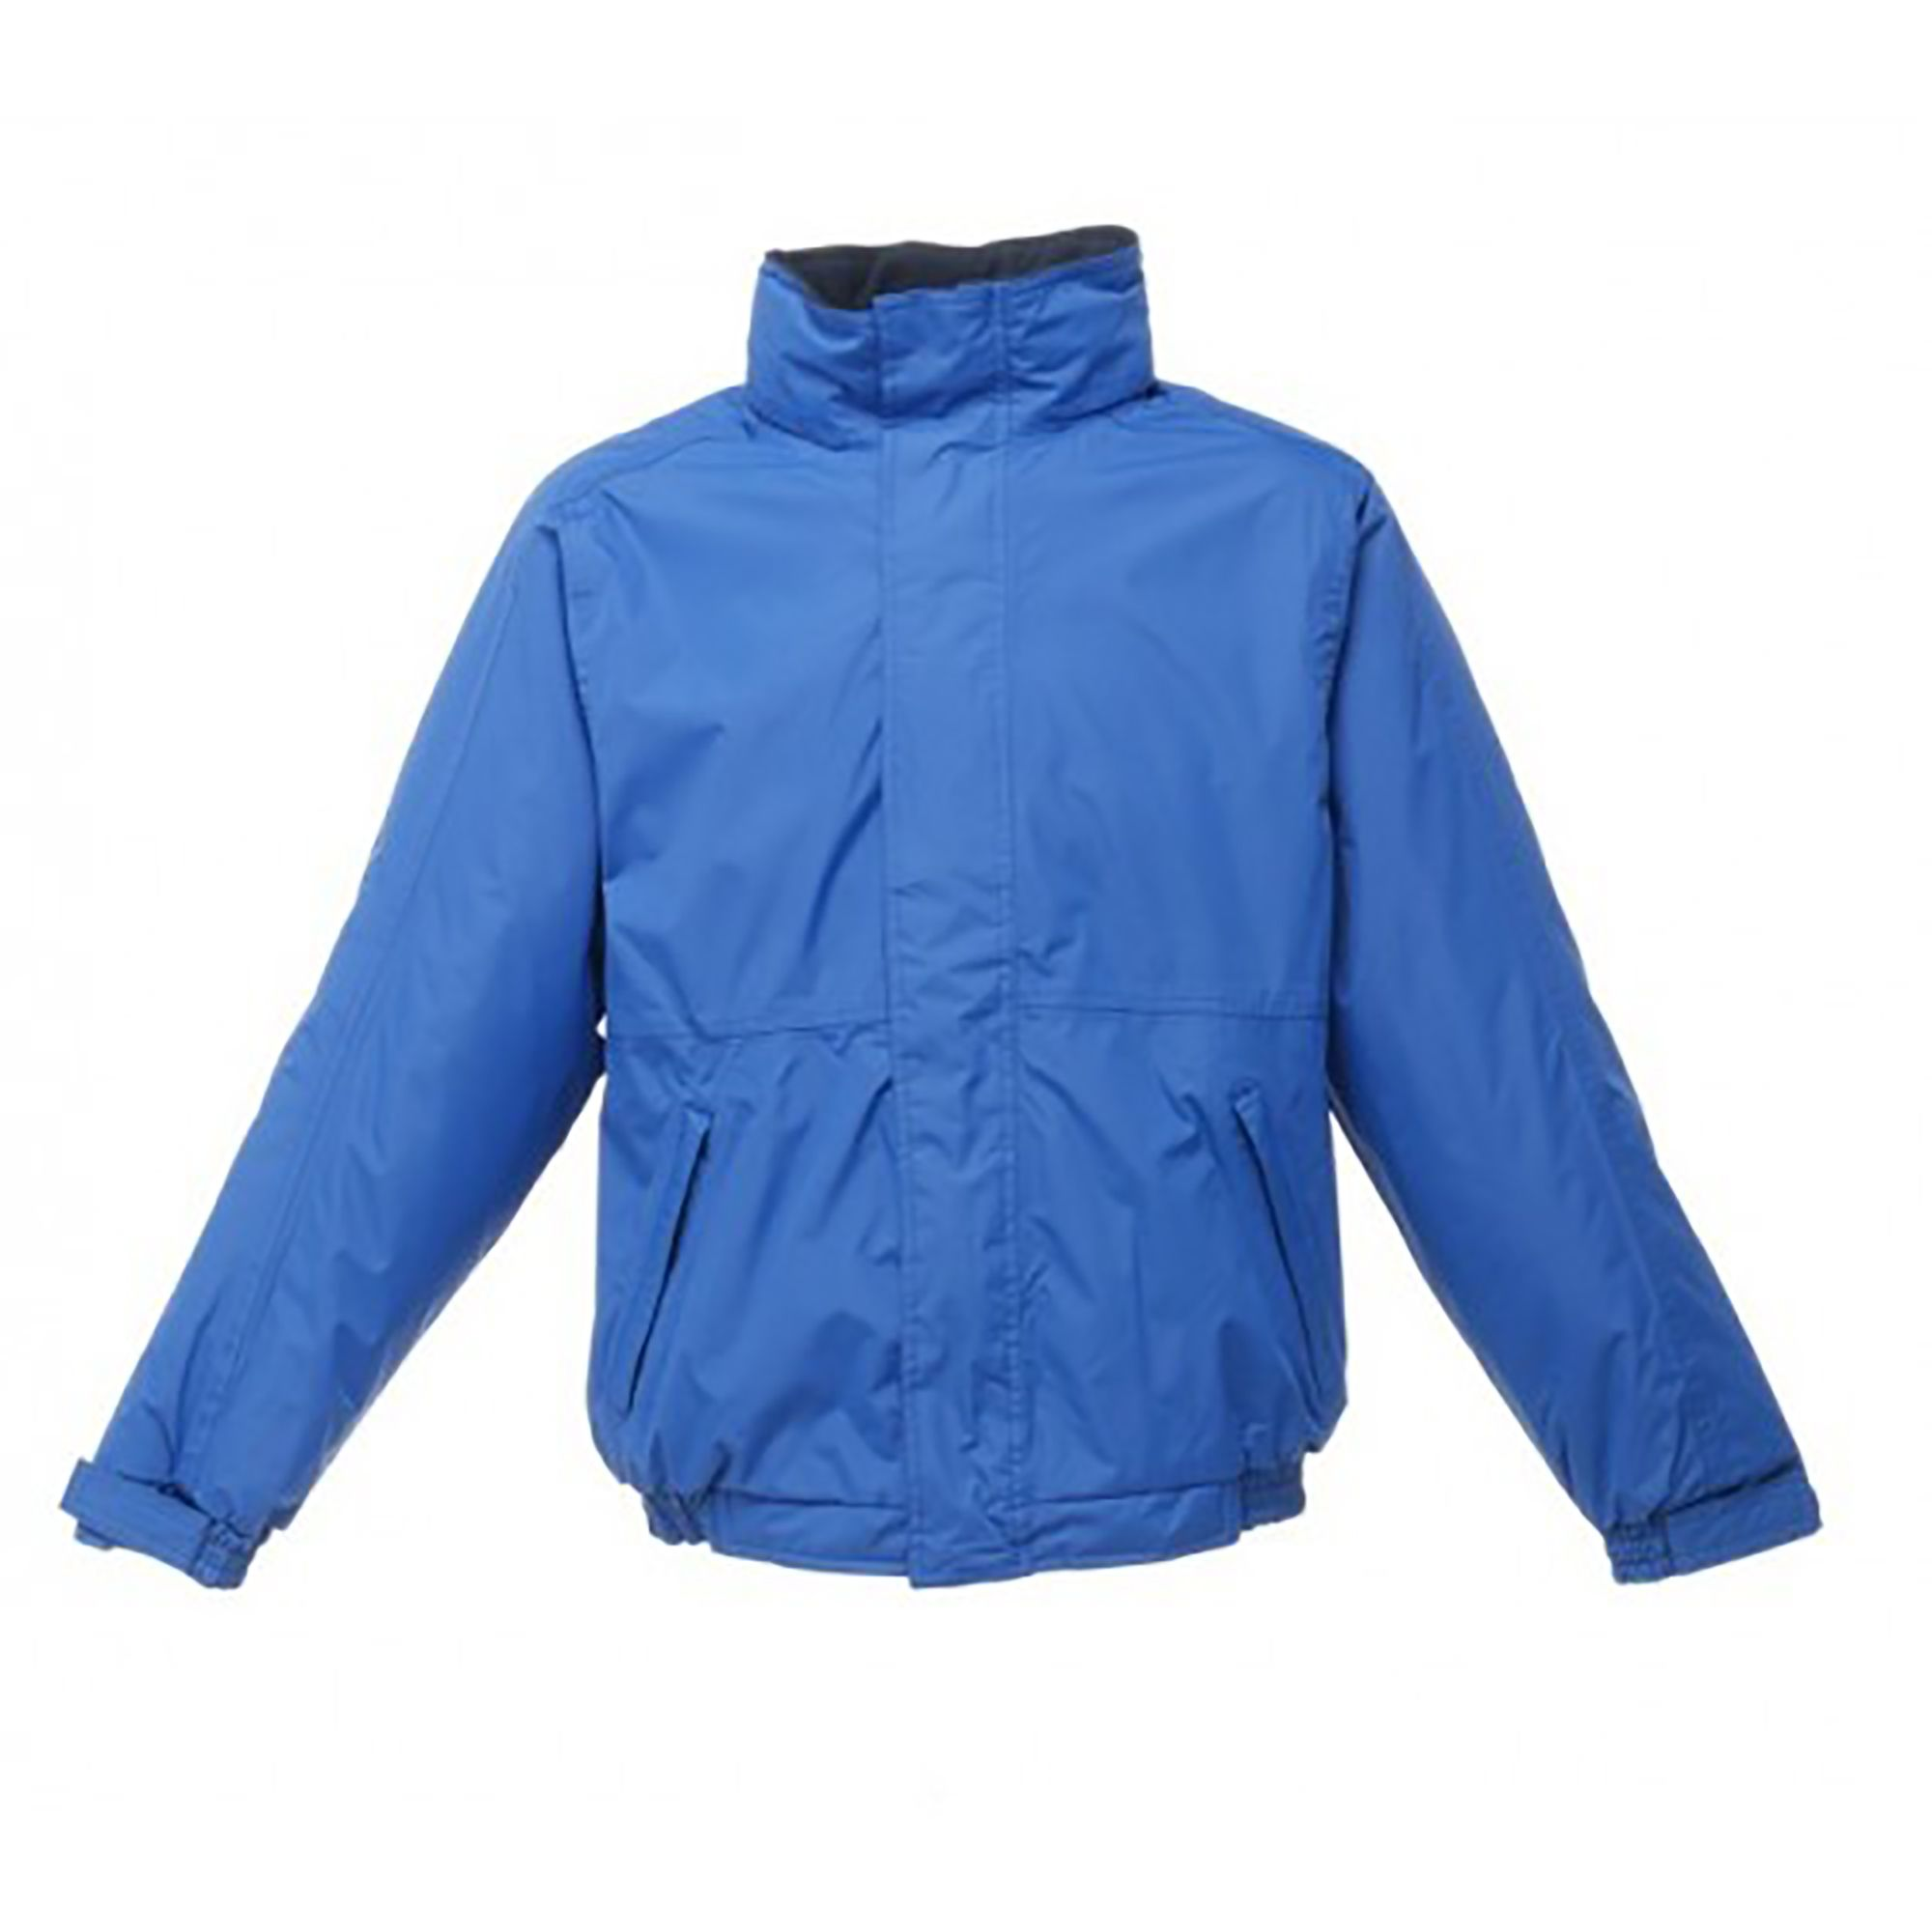 Regatta Dover Waterproof Windproof Jacket (Thermo-Guard Insulation) (Royal/Dark Navy)